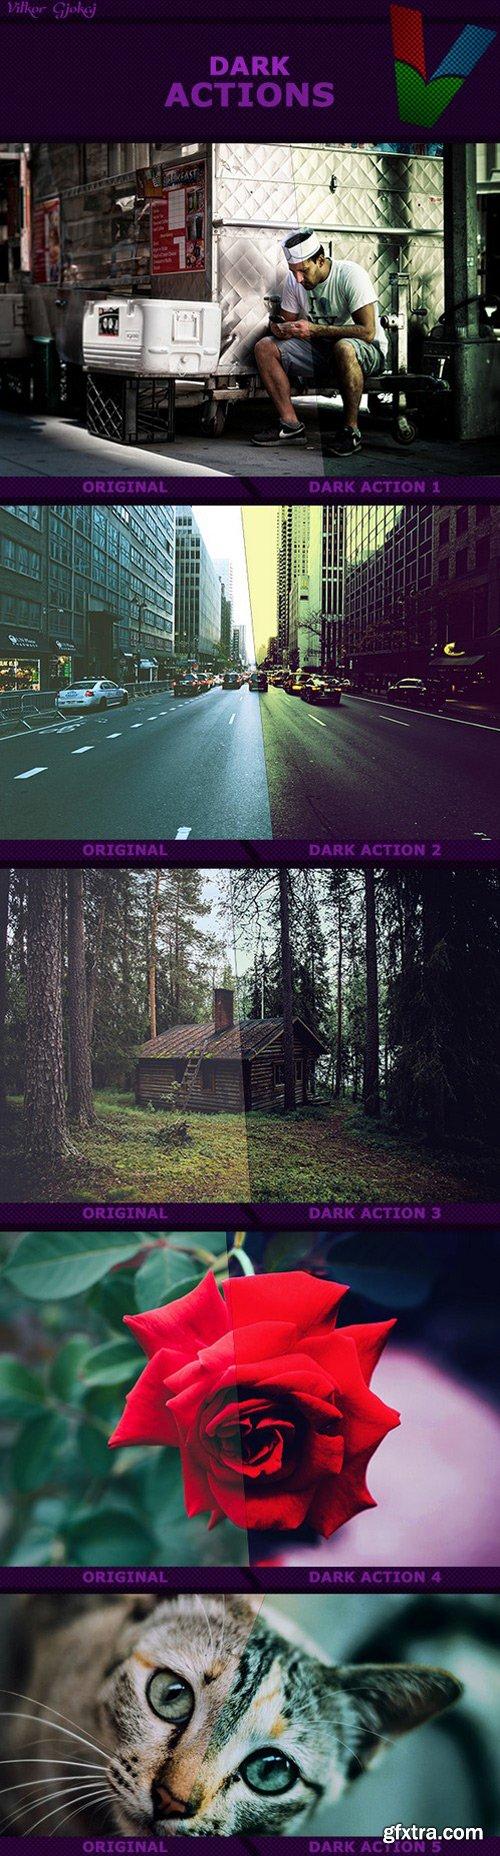 Graphicriver - Dark Action I 14381732